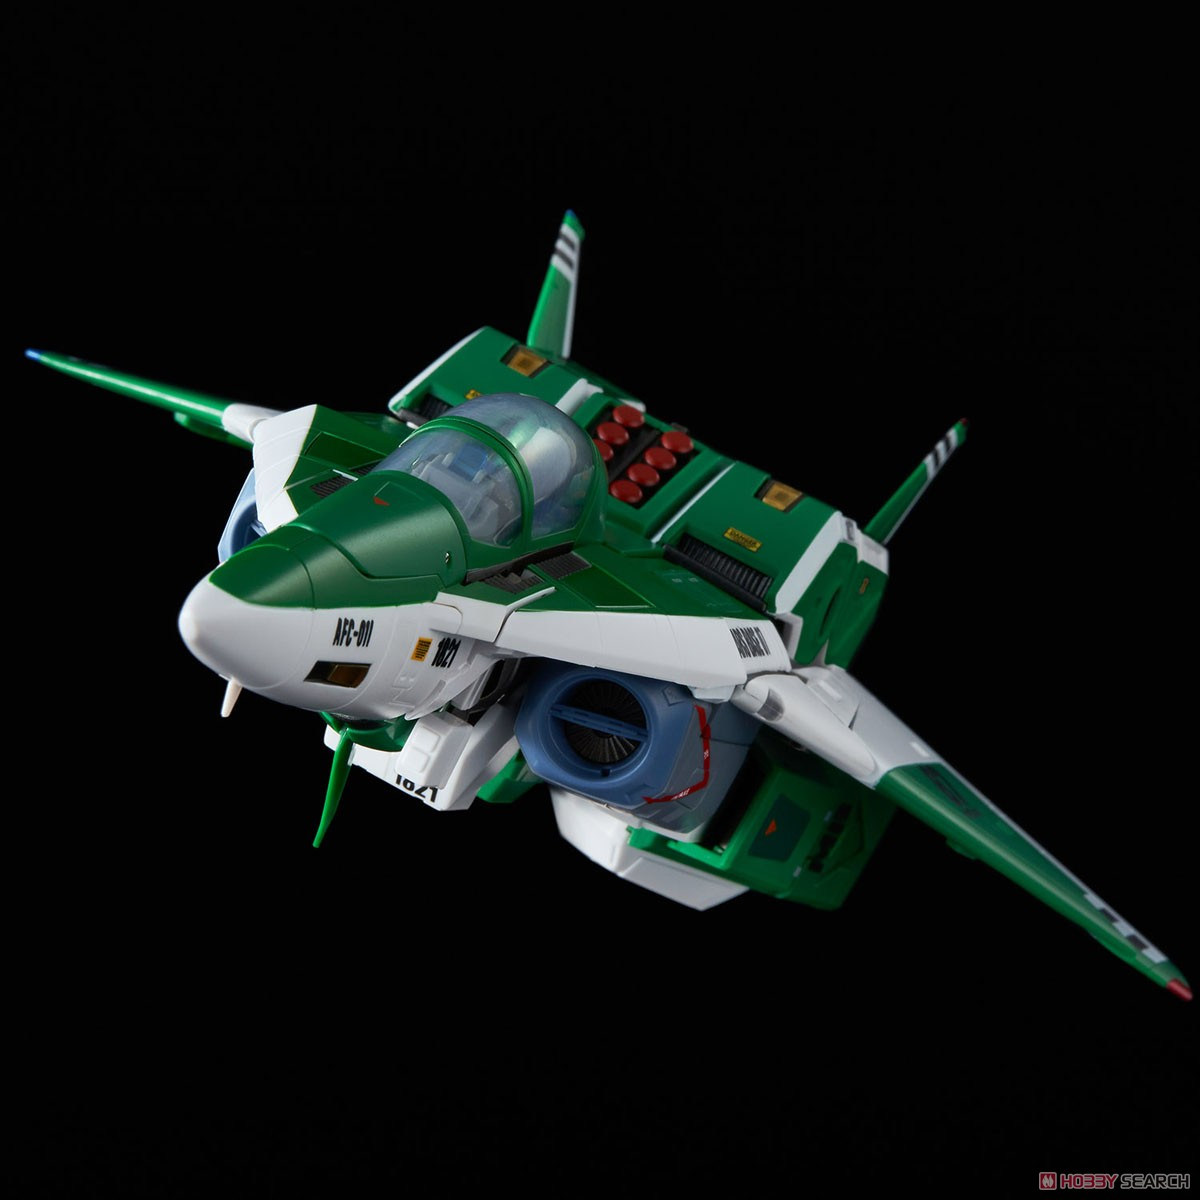 RIOBOT『AFC-01I レギオス・イオタ』機甲創世記モスピーダ 1/48 可変可動フィギュア-011